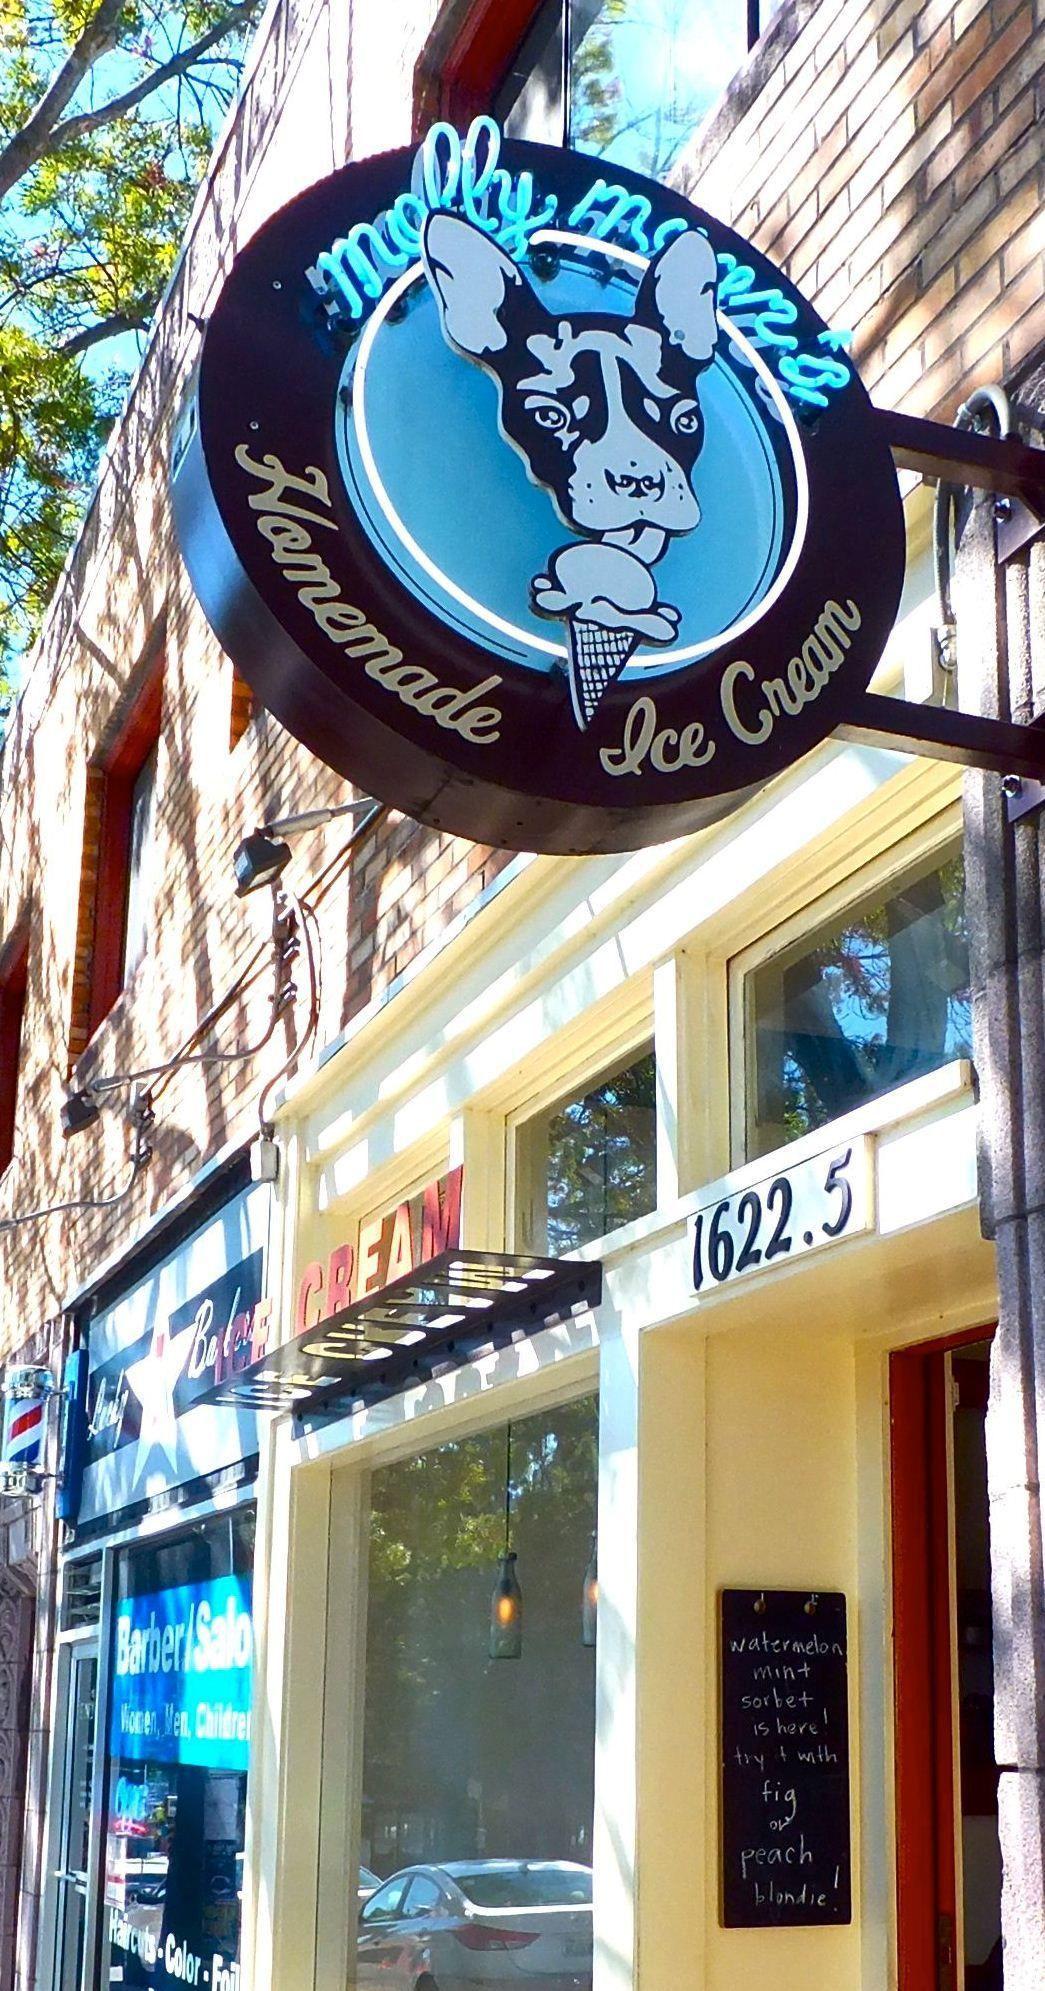 Molly Moon's Homemade Ice Cream - Seattle, WA